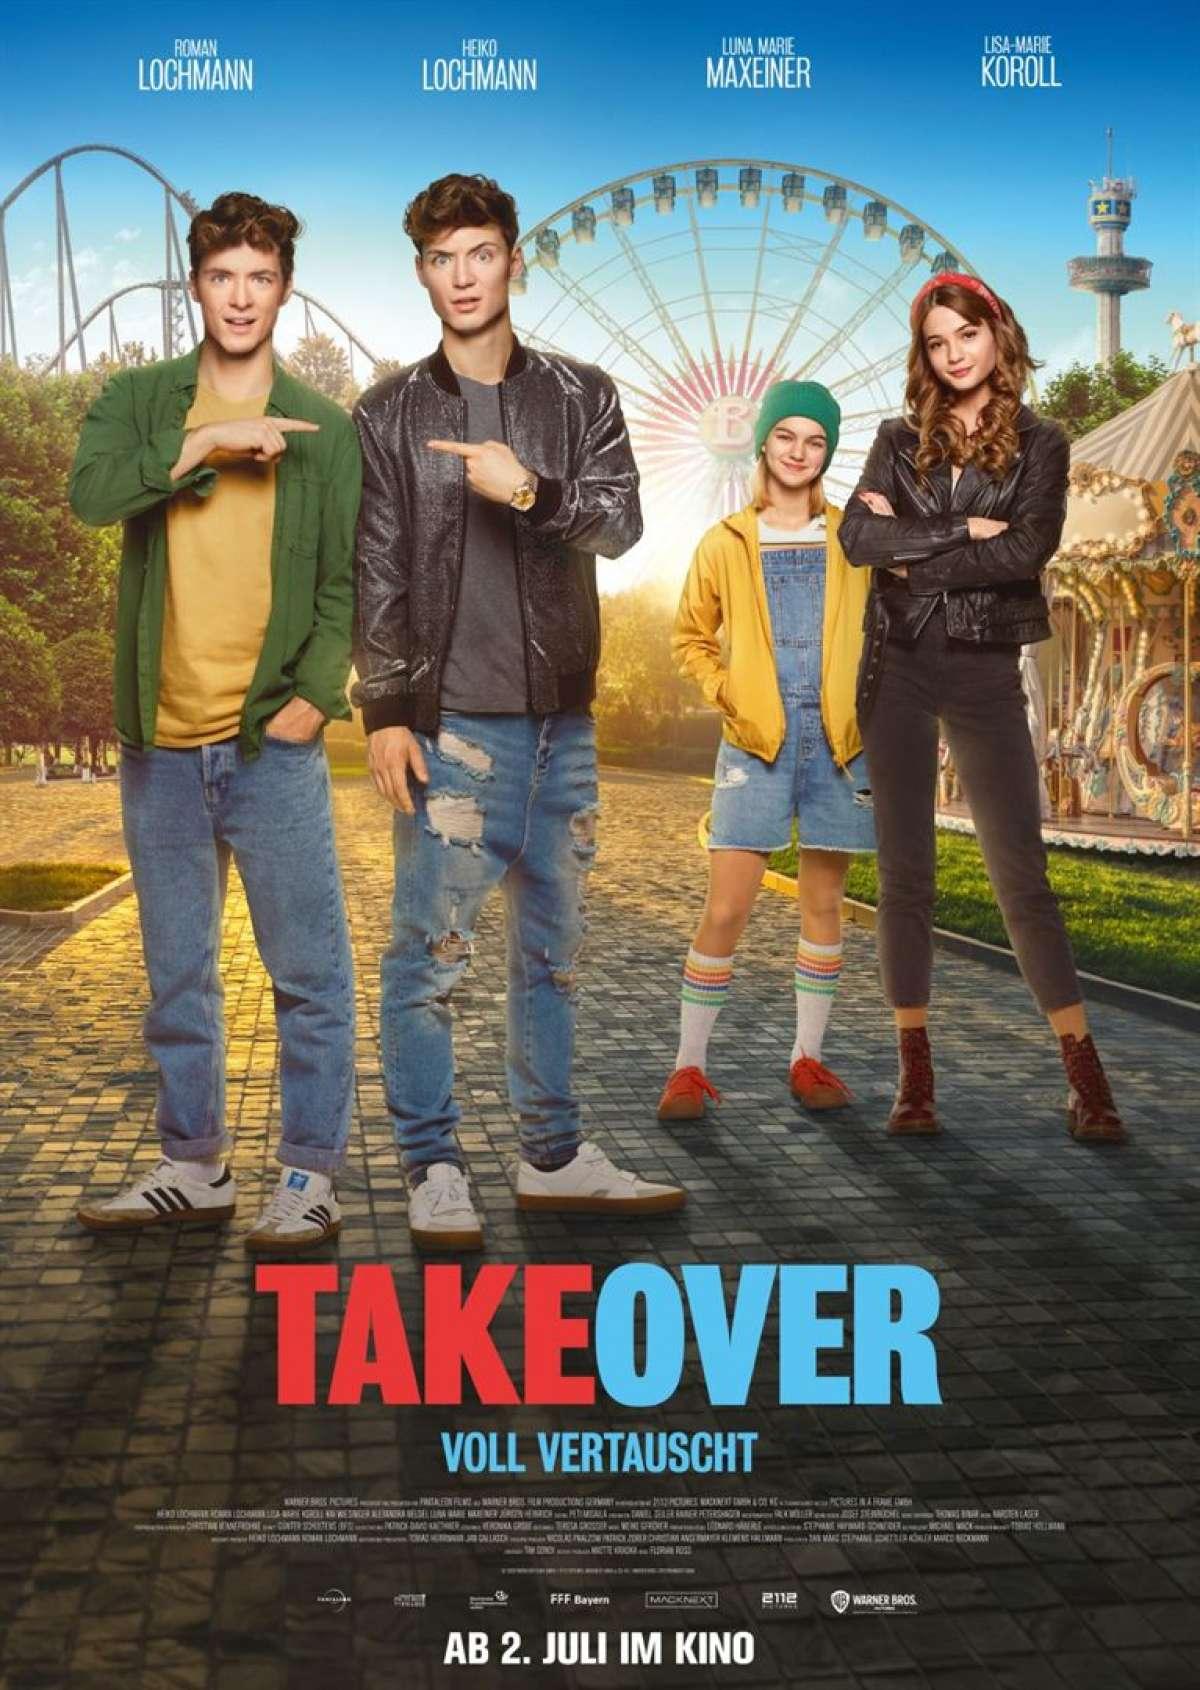 Takeover - Voll Vertauscht - Cine-Royal  - Fritzlar